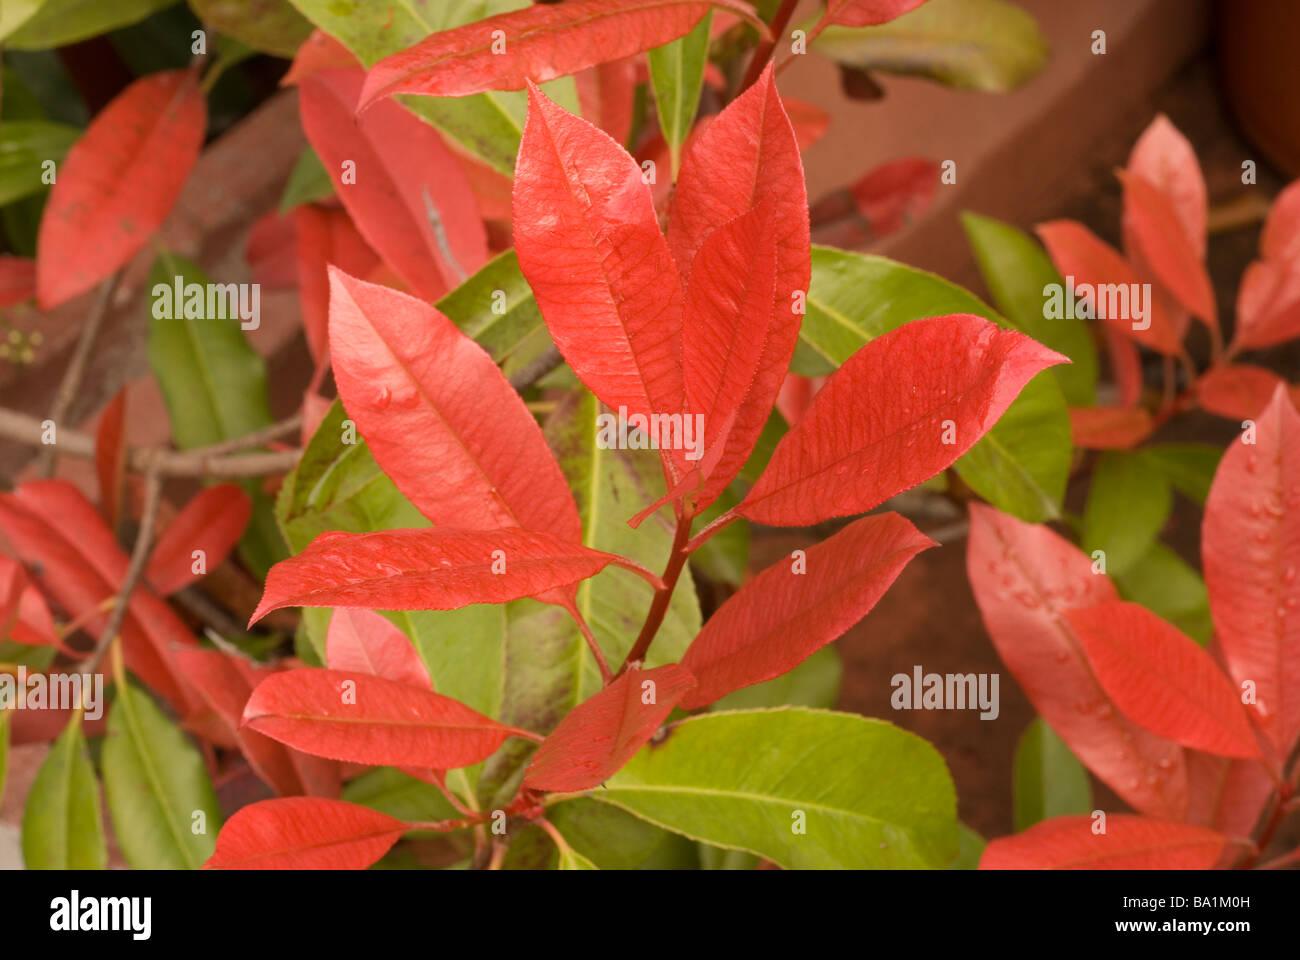 Photinia x fraseri flowers close up, Rosaceae - Stock Image